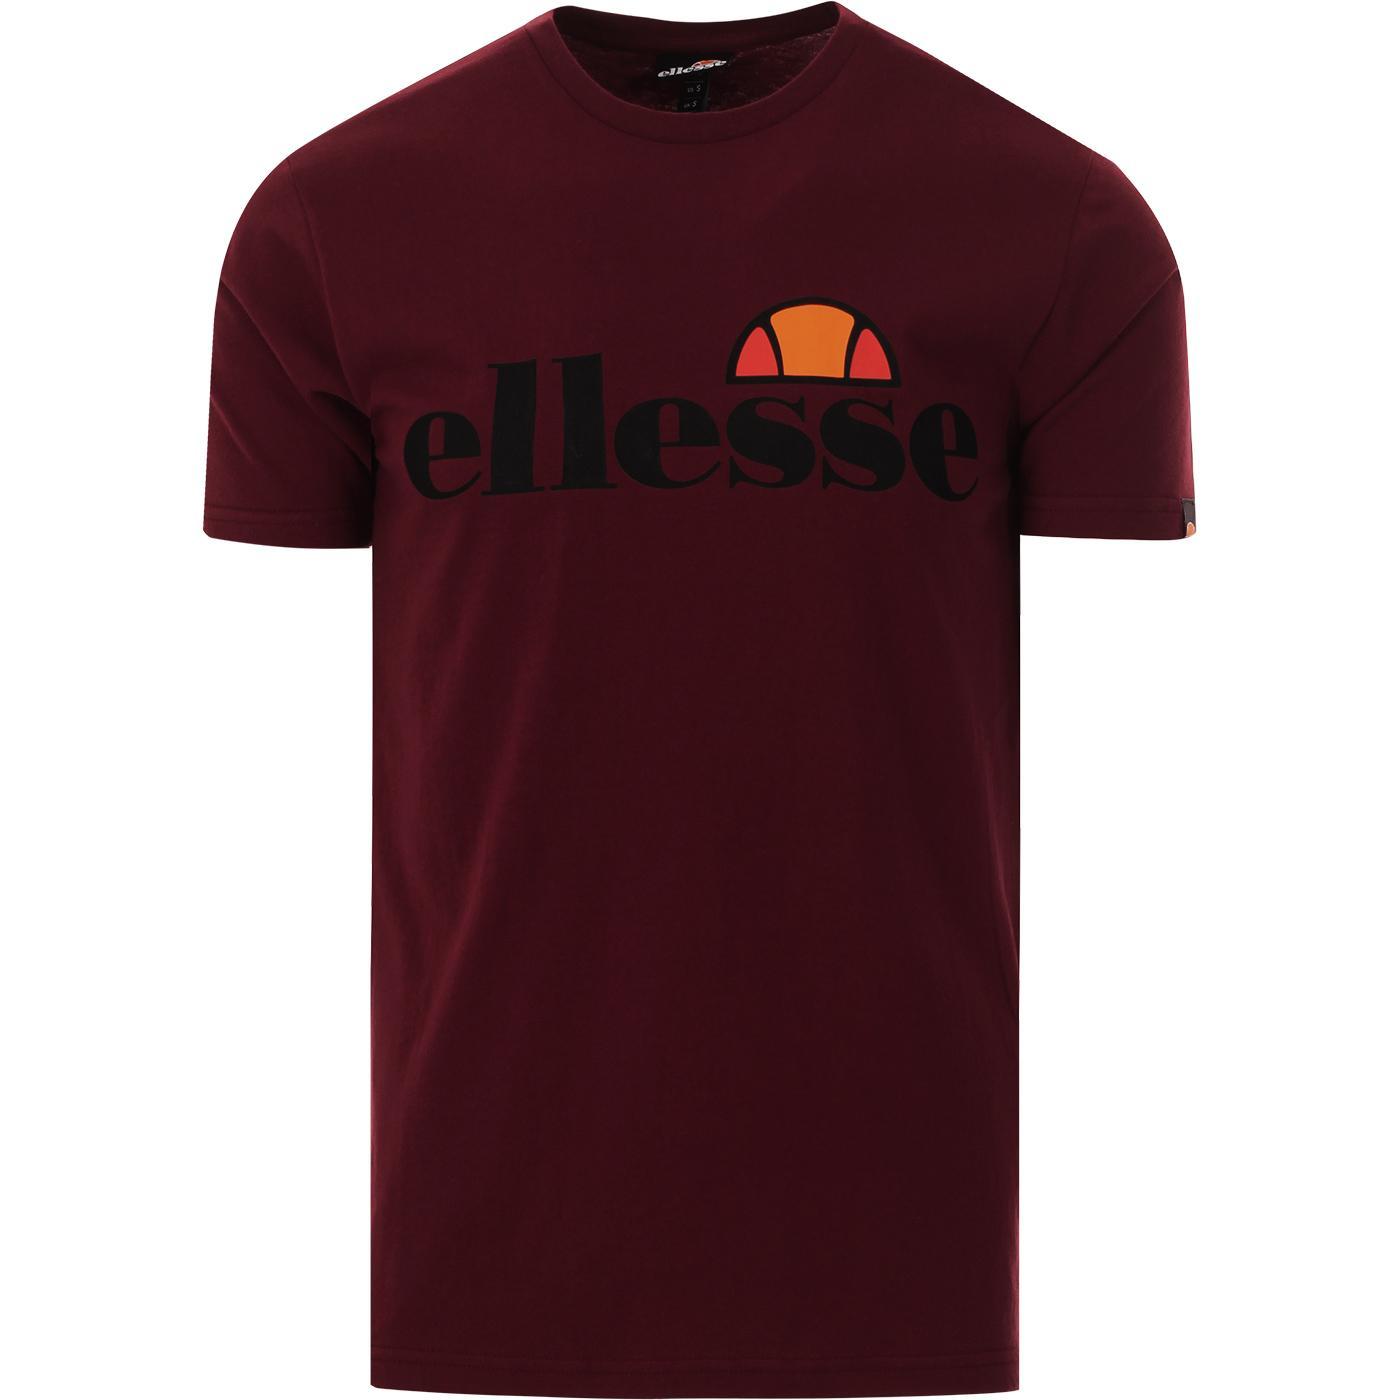 Prado ELLESSE Retro 80s Logo Crew Tee (Burgundy)